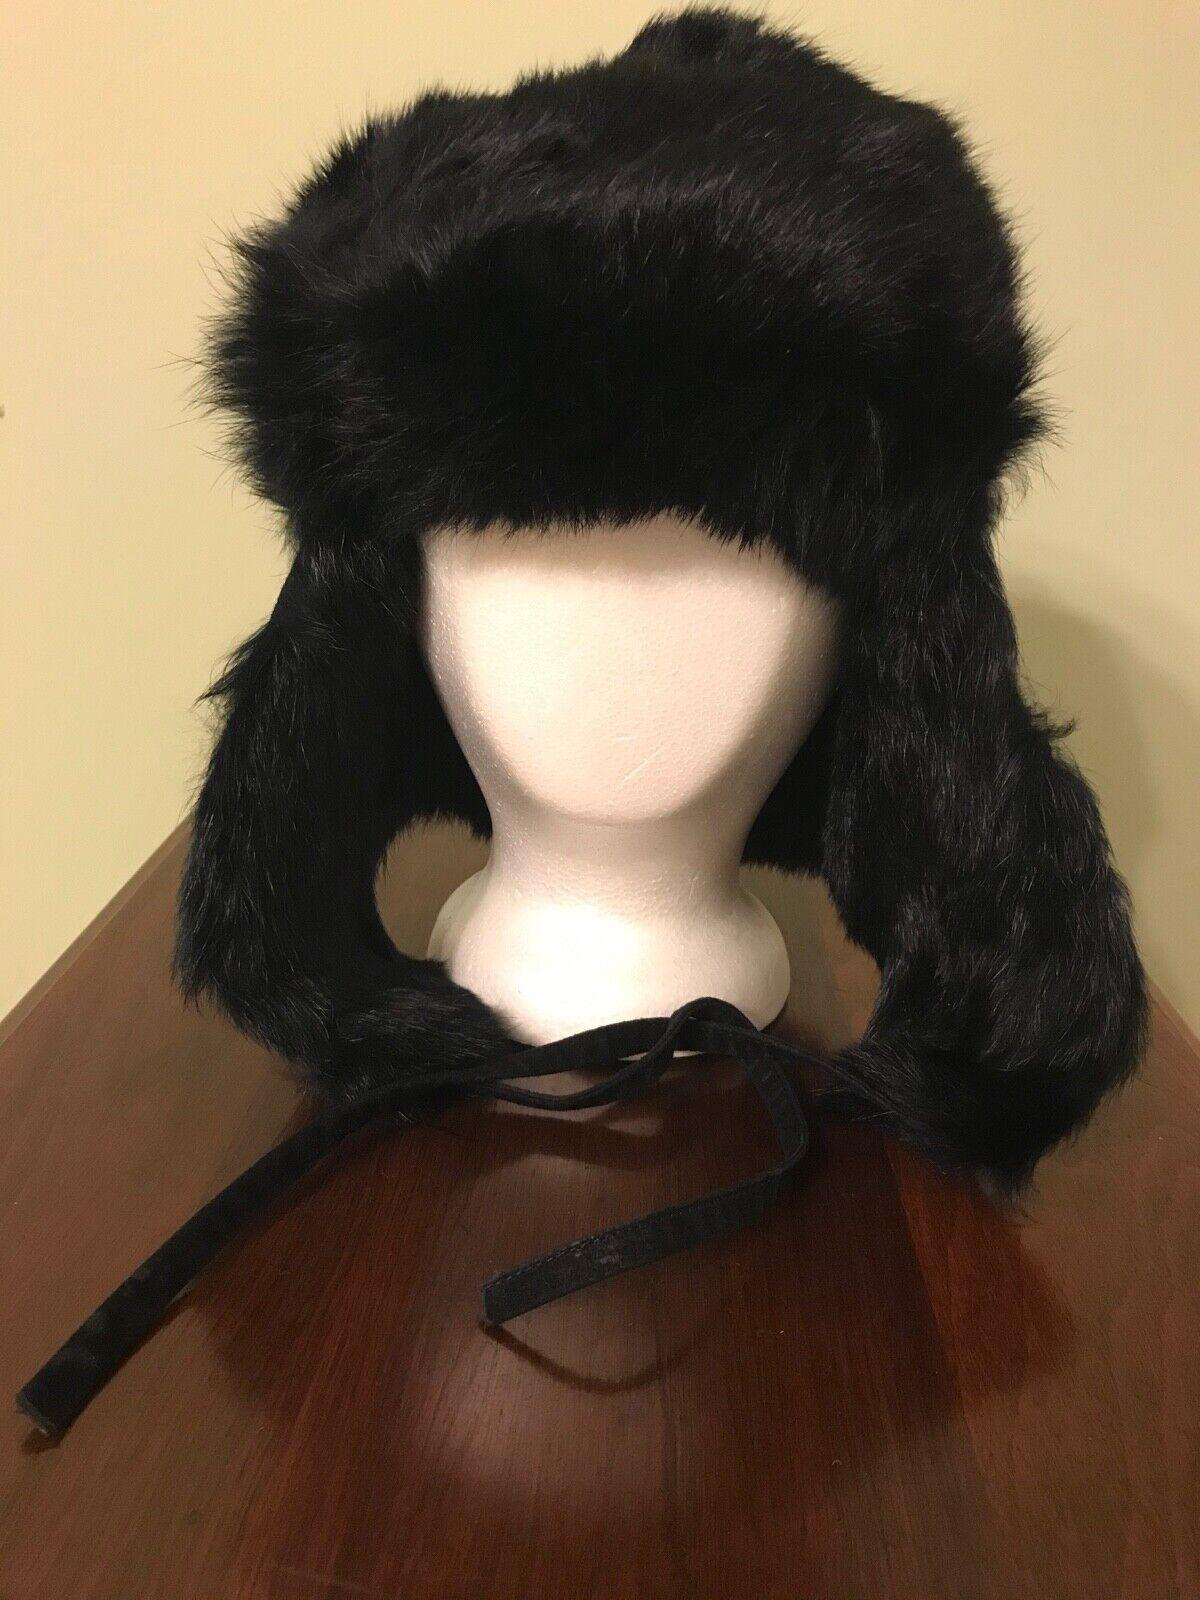 Vintage Black Mink Ladies' Hat with Flap Ear Muffs - image 9